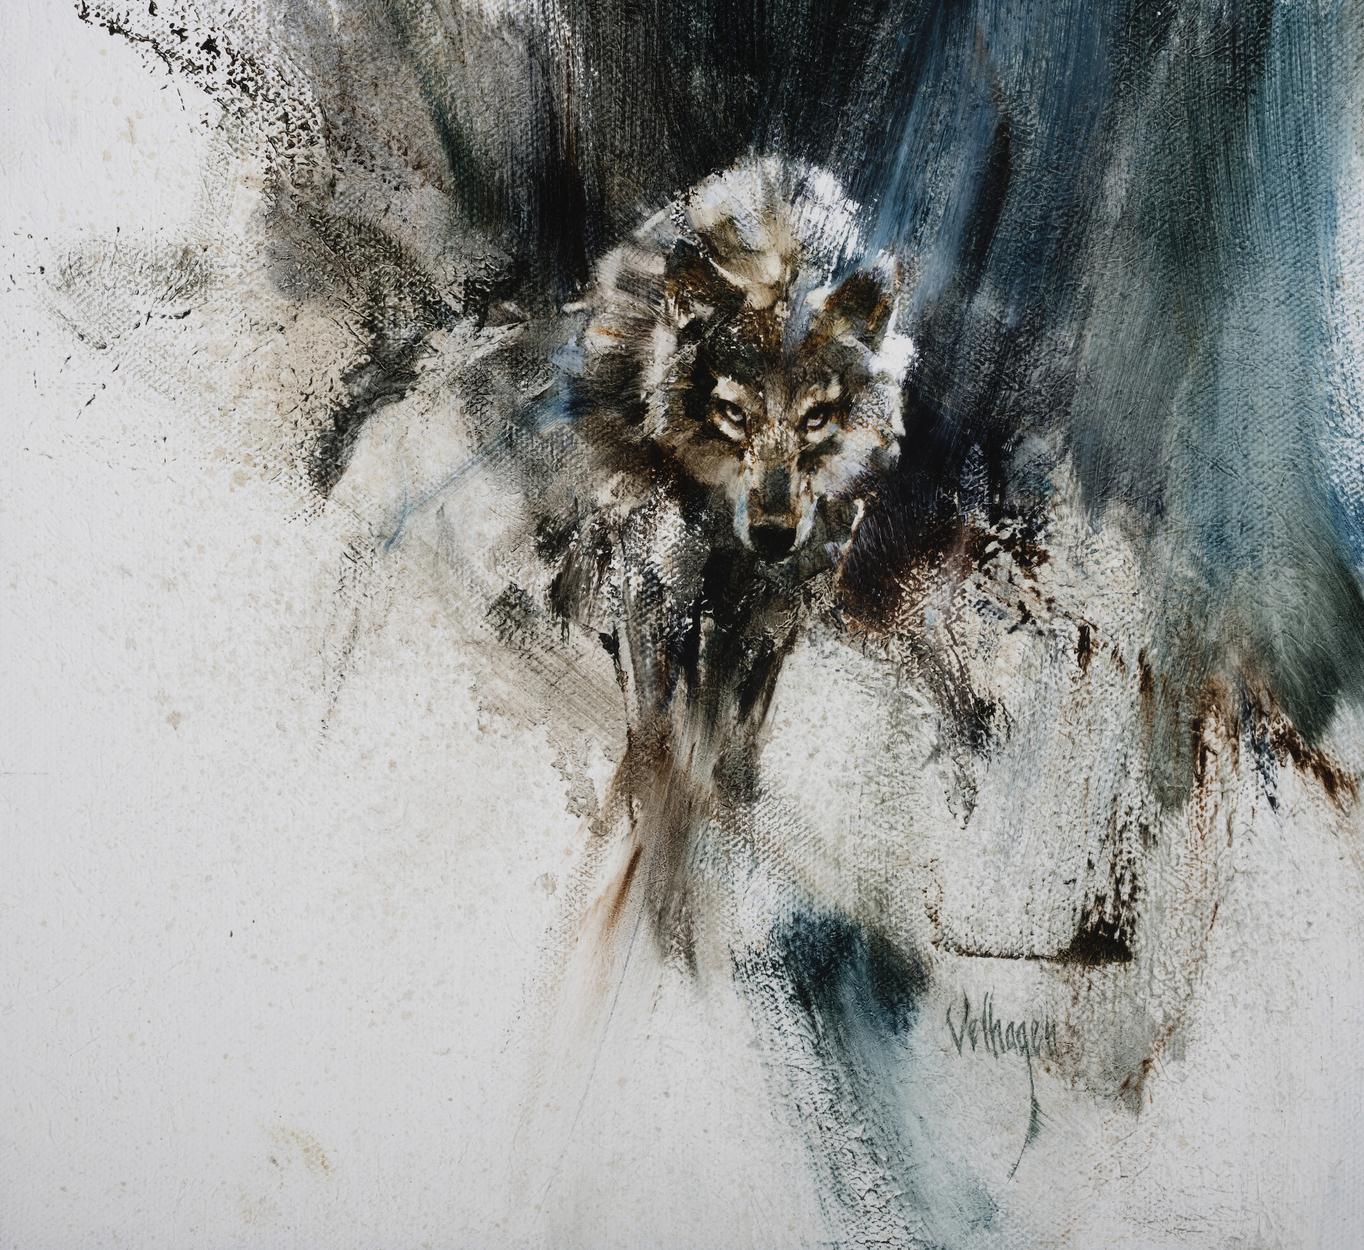 Wolf Study Artwork by Eric Velhagen